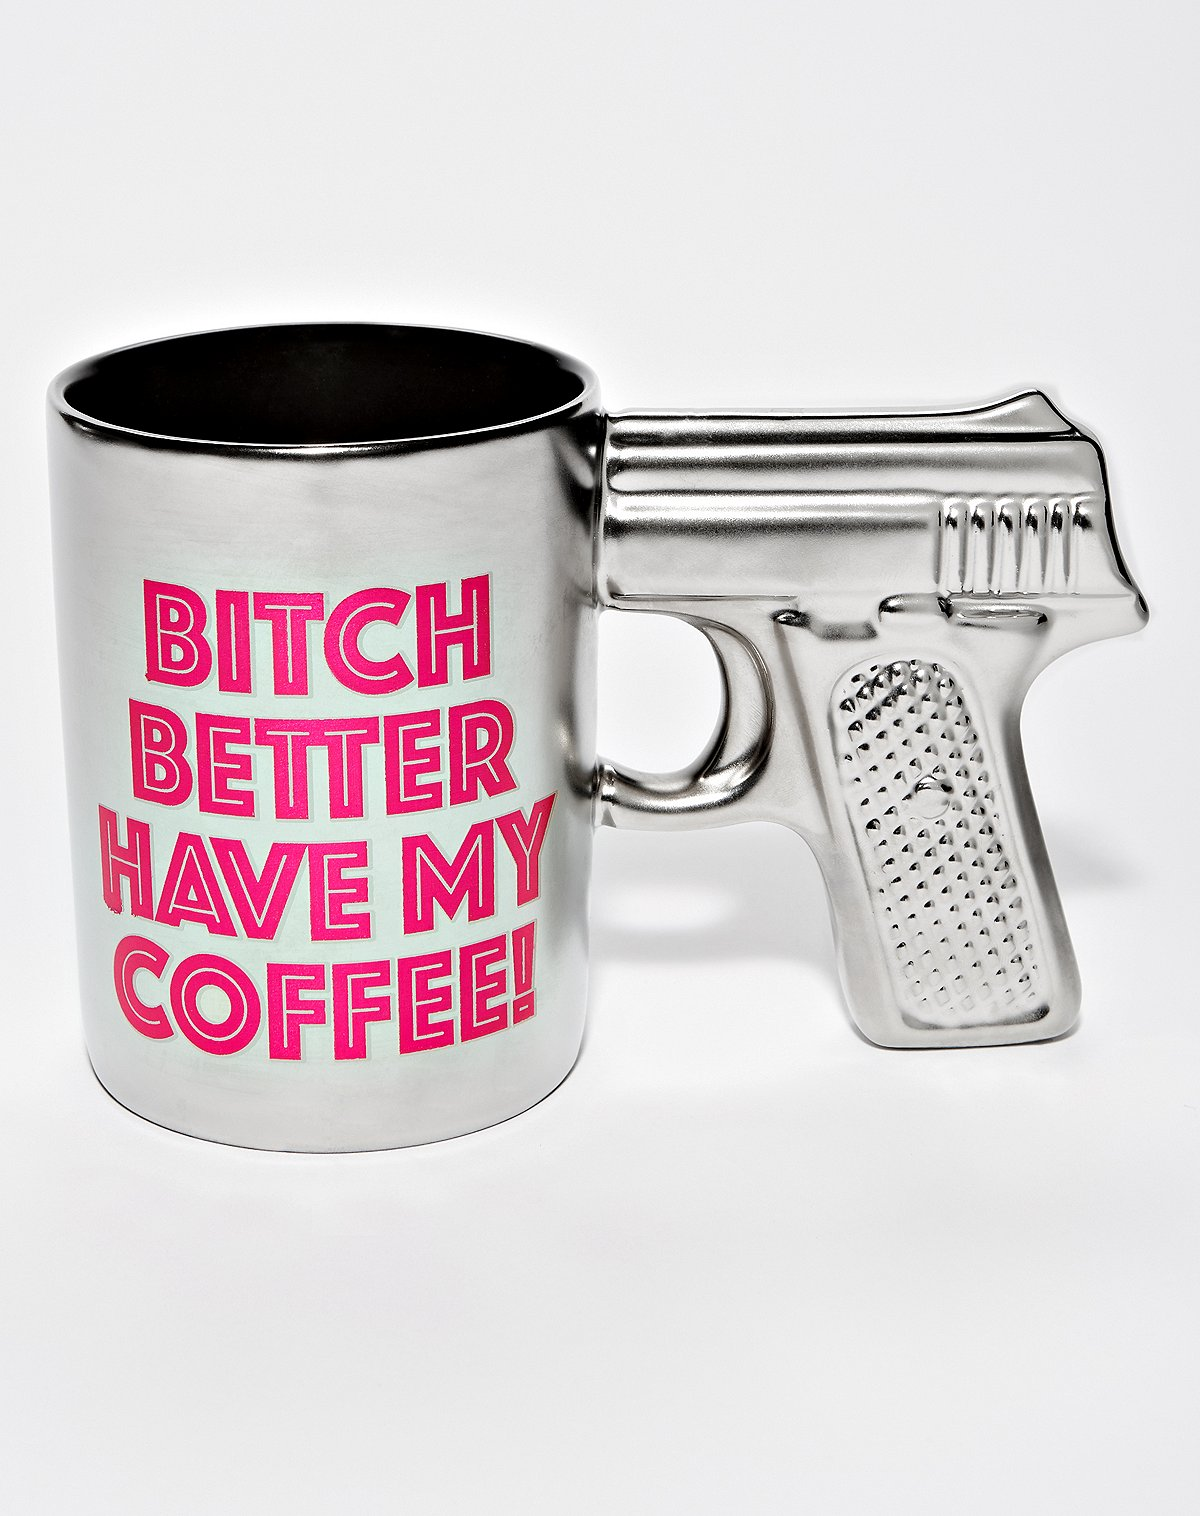 bitch better have my coffee gun mug